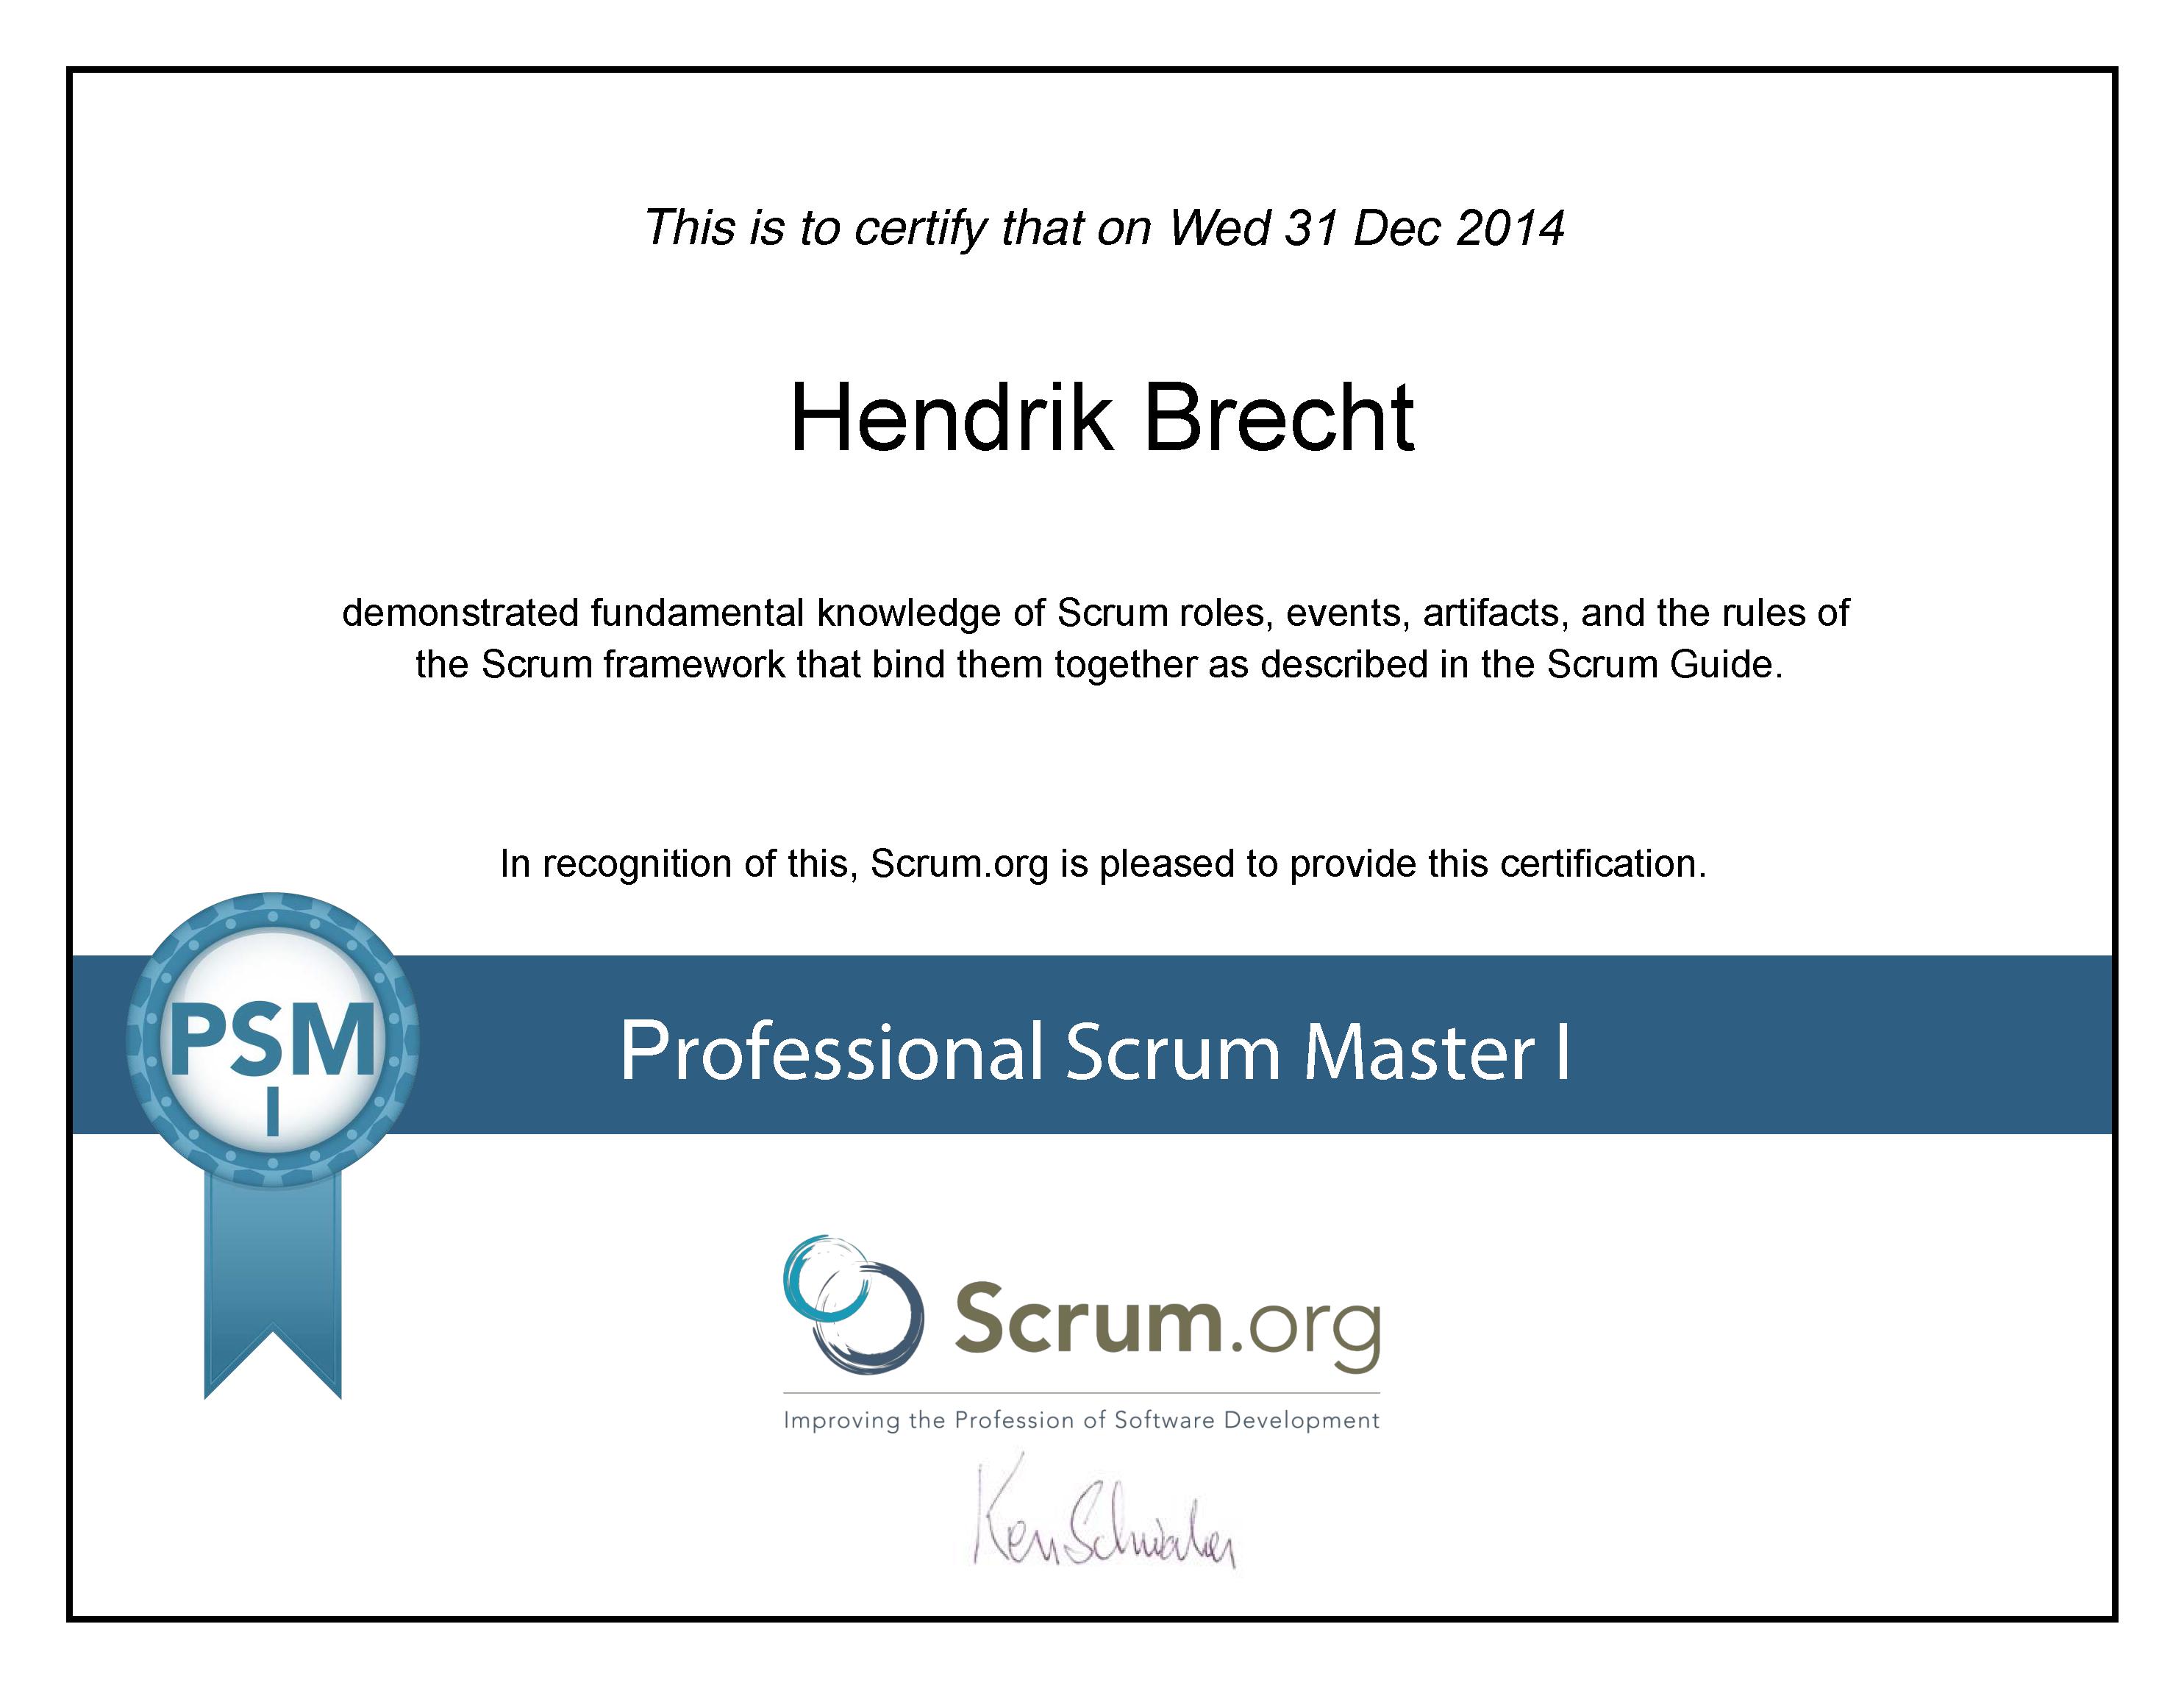 Hendrik Brecht - Professional Scrum Master 2014 PSM